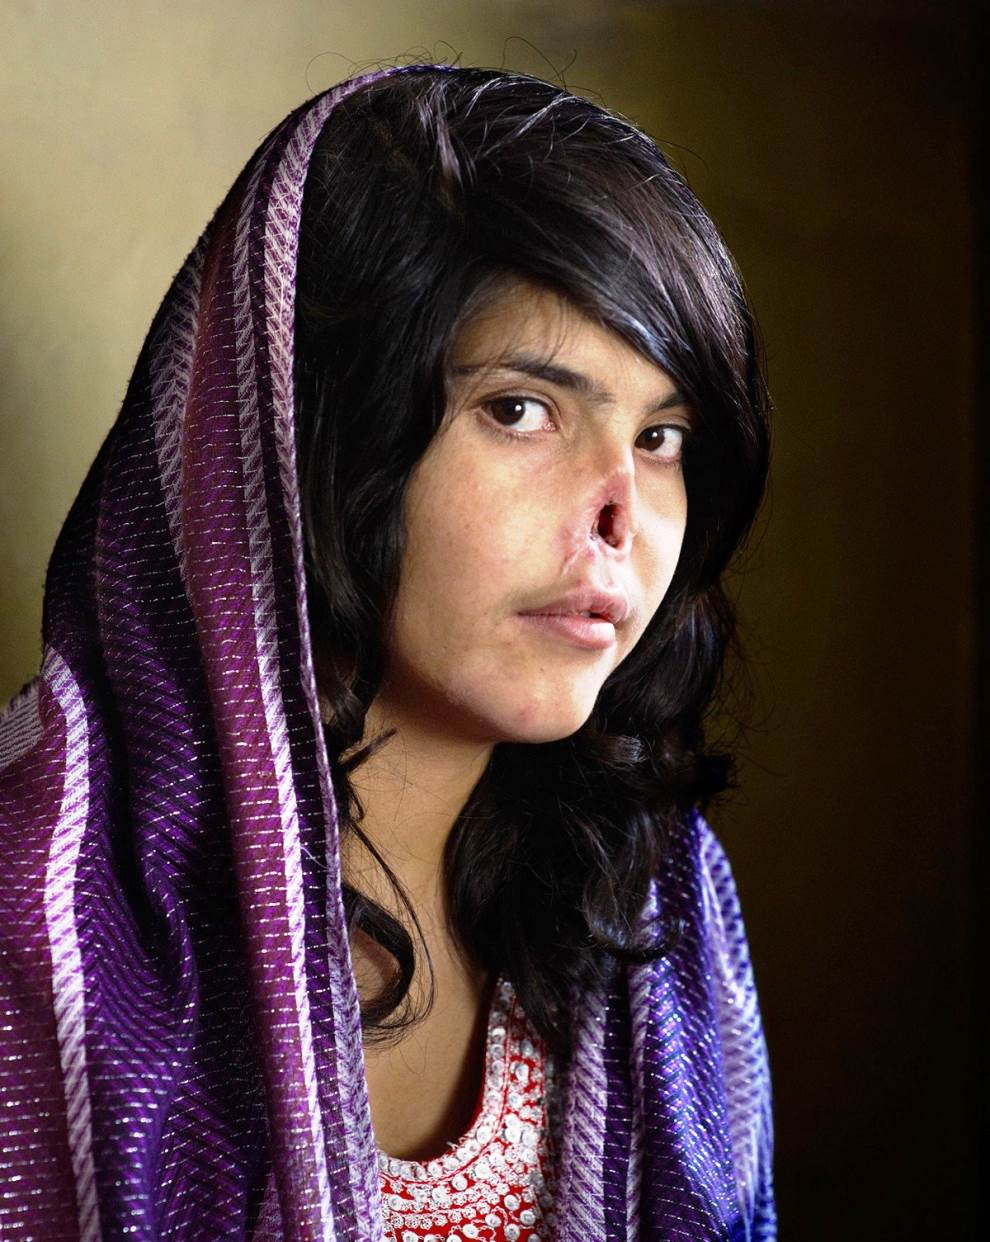 Afghan Woman Mutilated By Taliban